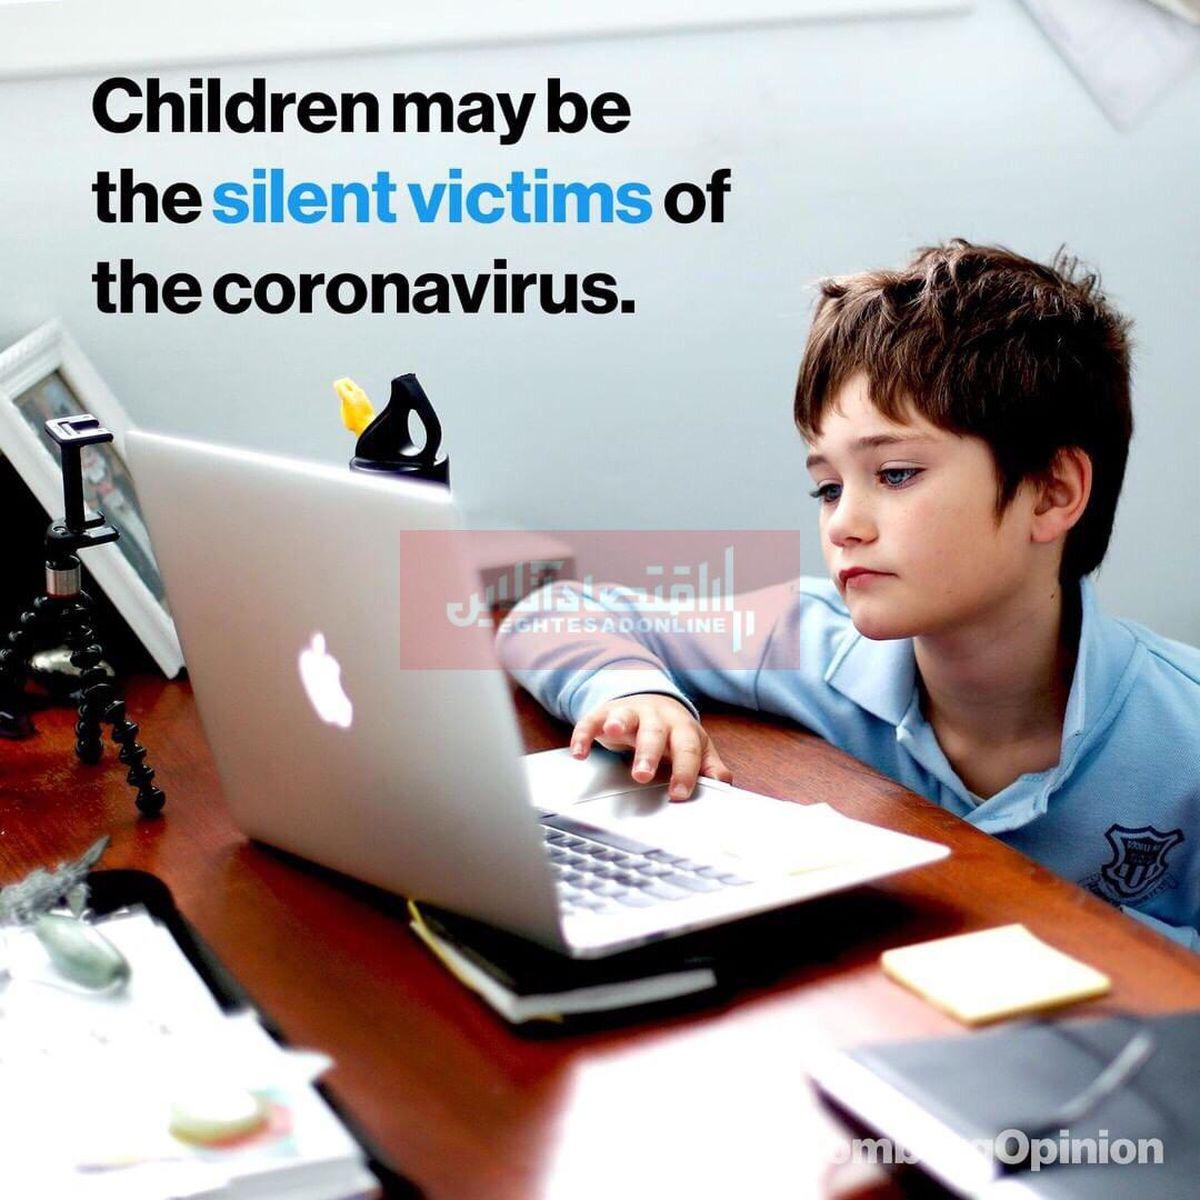 کودکان، قربانیان خاموش ویروس کرونا